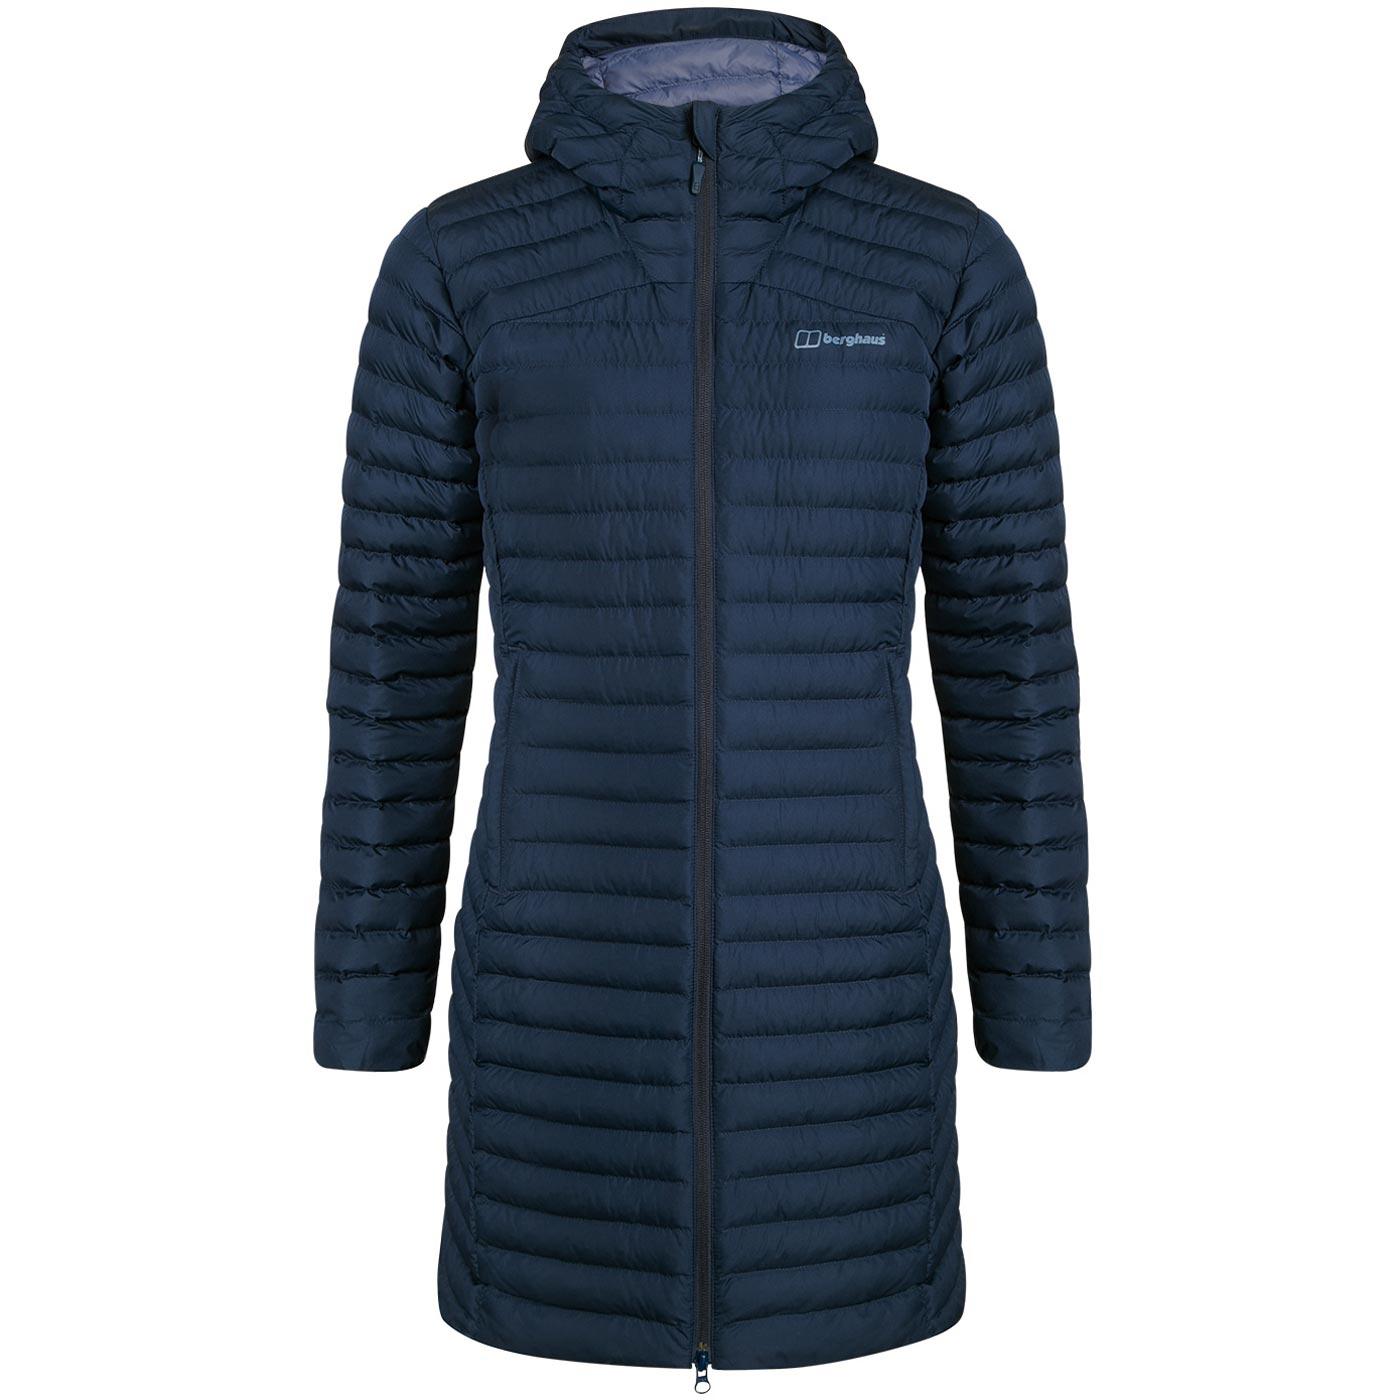 Berghaus Women's Nula Micro Long Insulated Jacket - Dusk R14